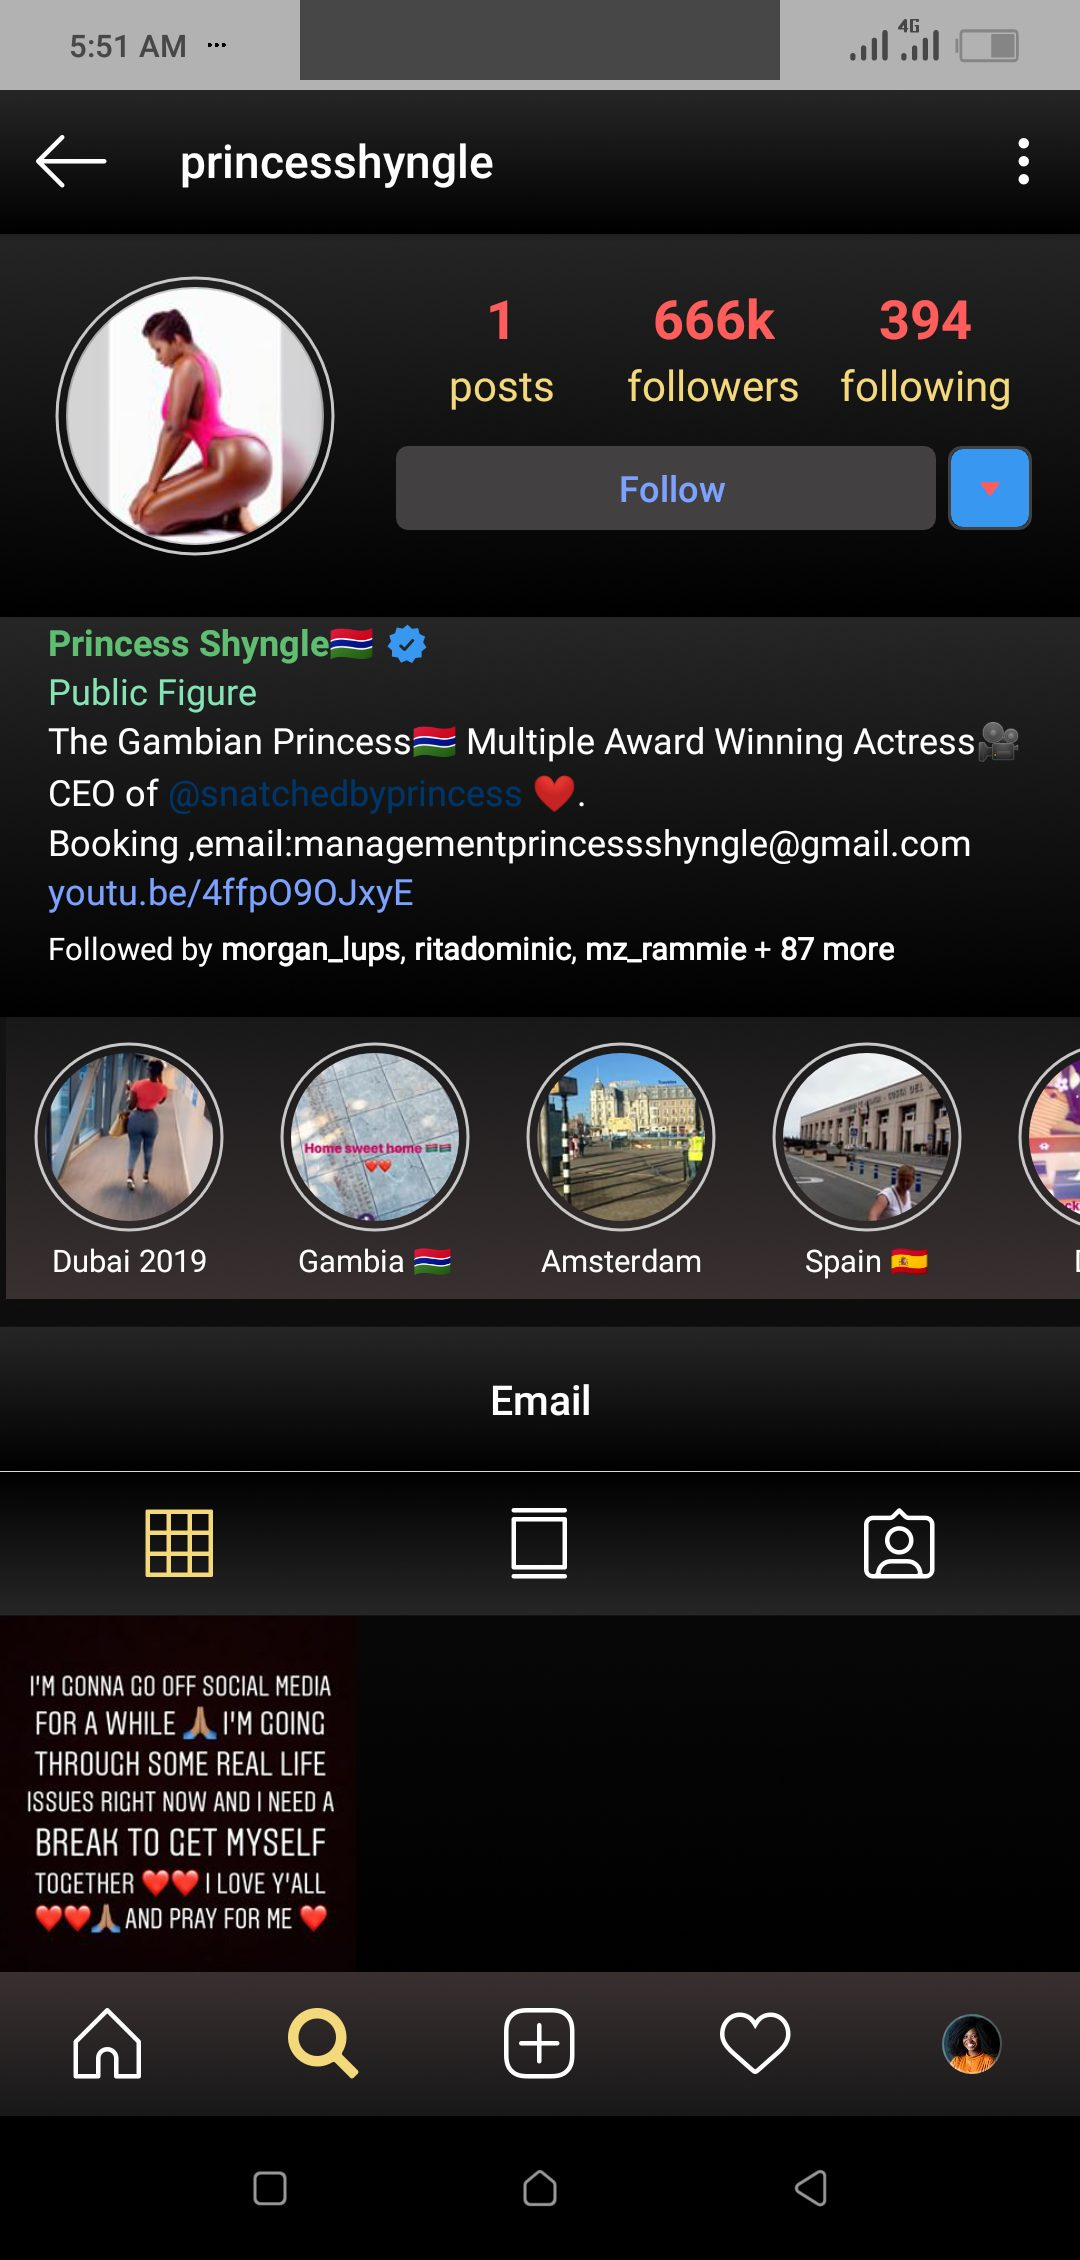 screenshot 20191002 0551264746710119353309542